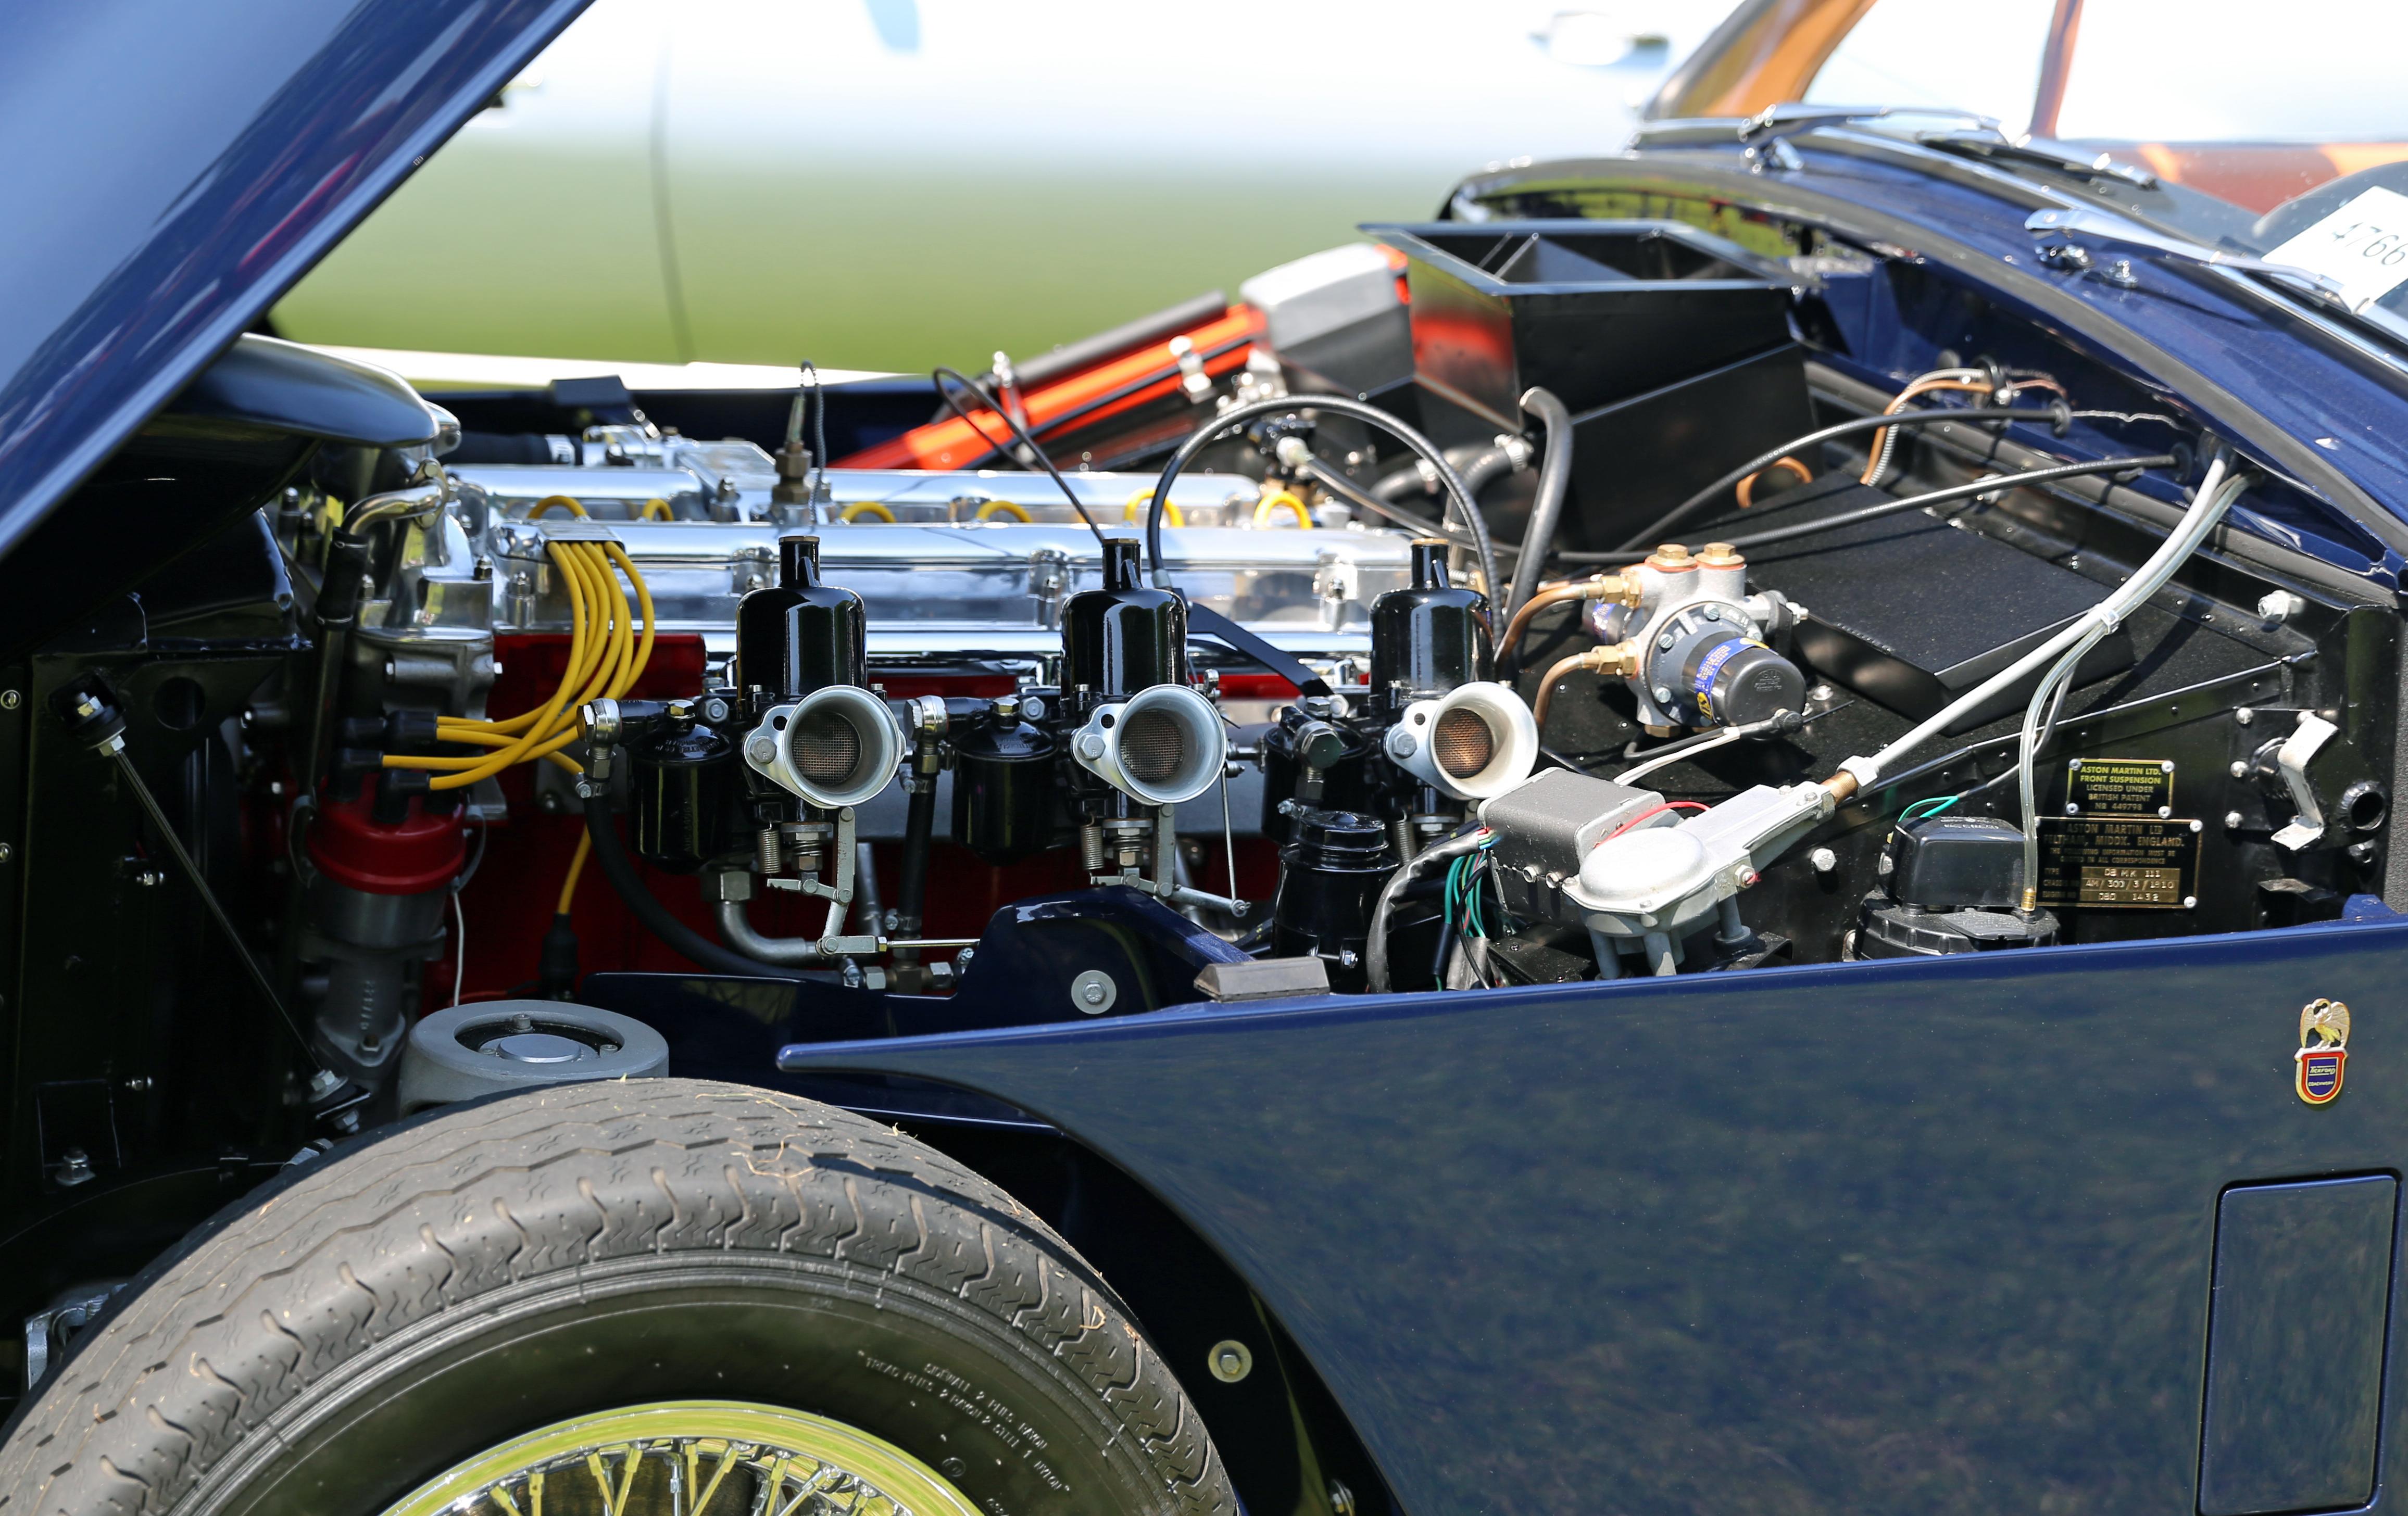 Lagonda Straight 6 Engine Wikipedia